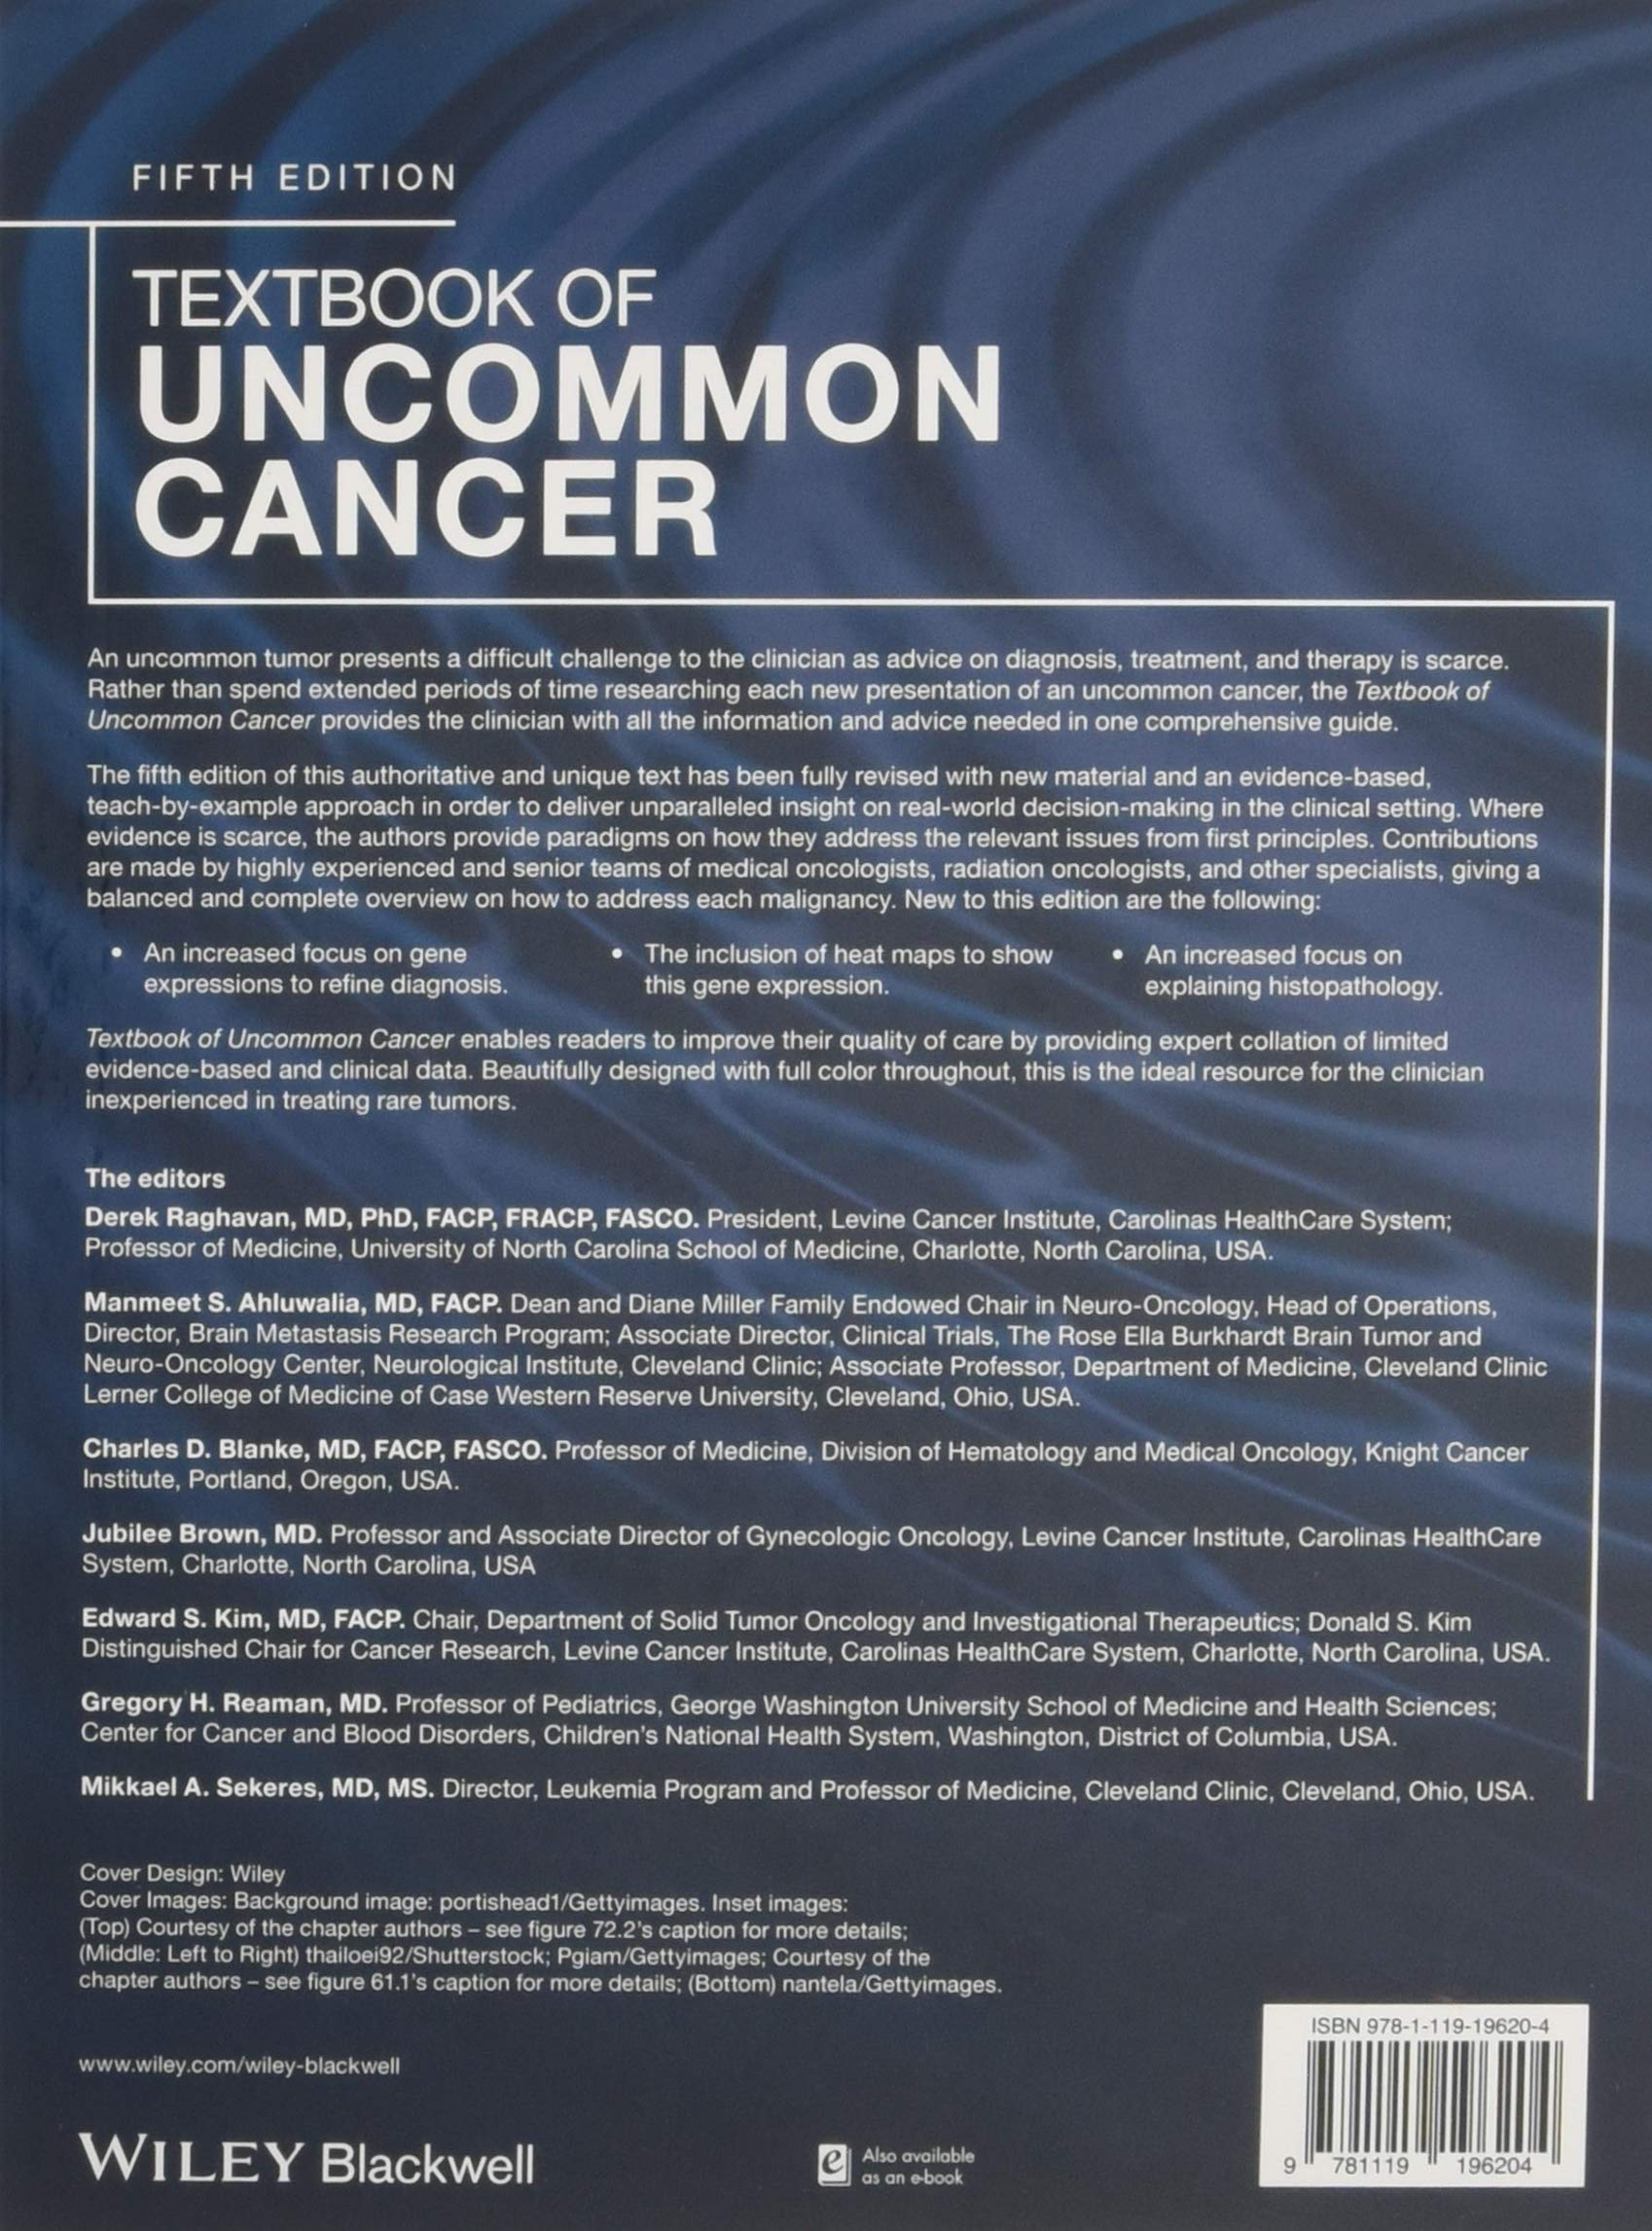 Textbook of Uncommon Cancer: Amazon co uk: Derek Raghavan